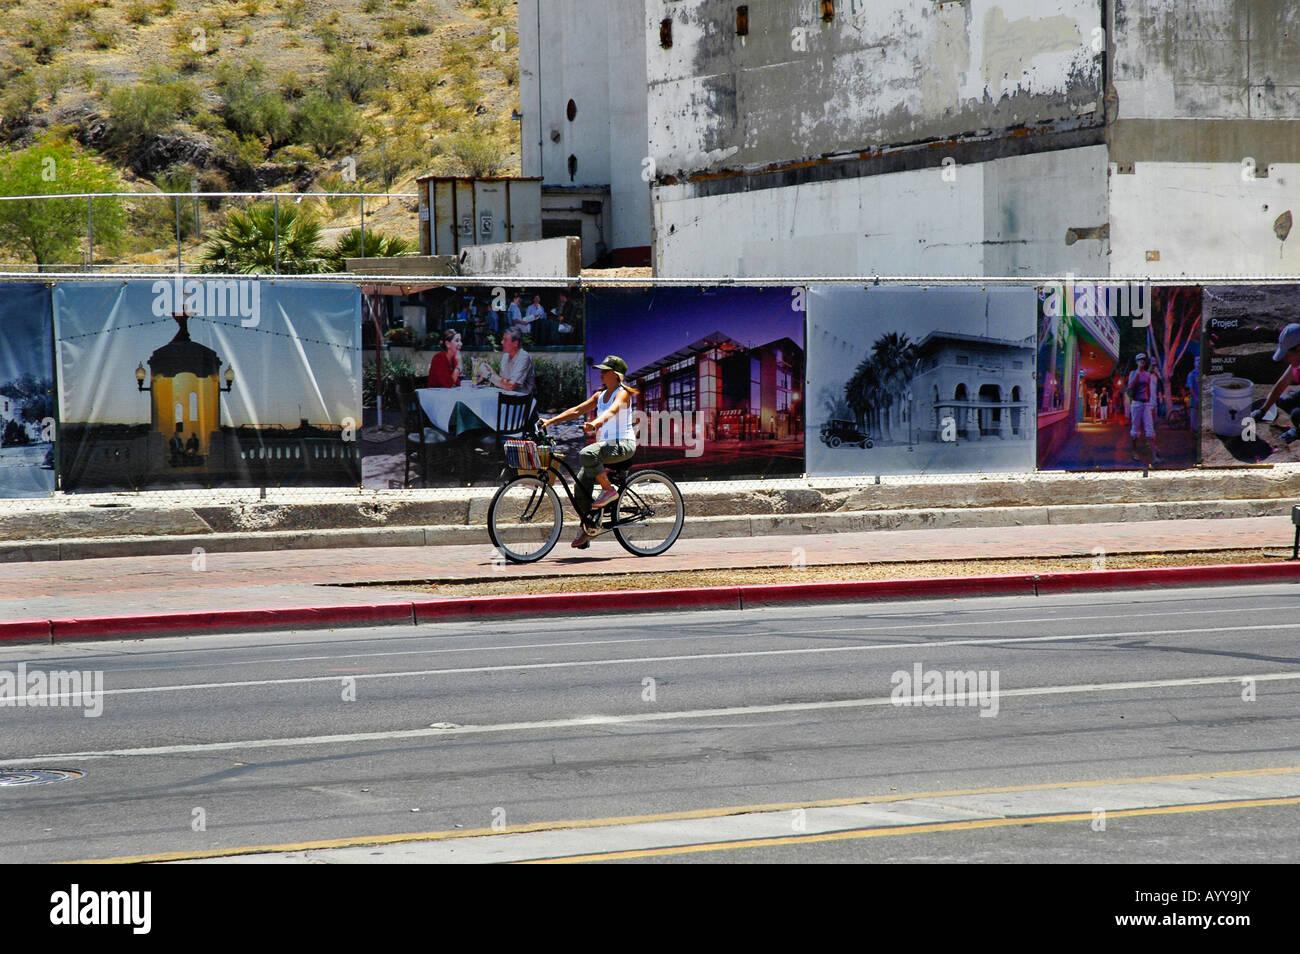 Bike-Fahrer vor dem Hayden Getreidemühle archäologische Projekt Tempe AZ Stockbild